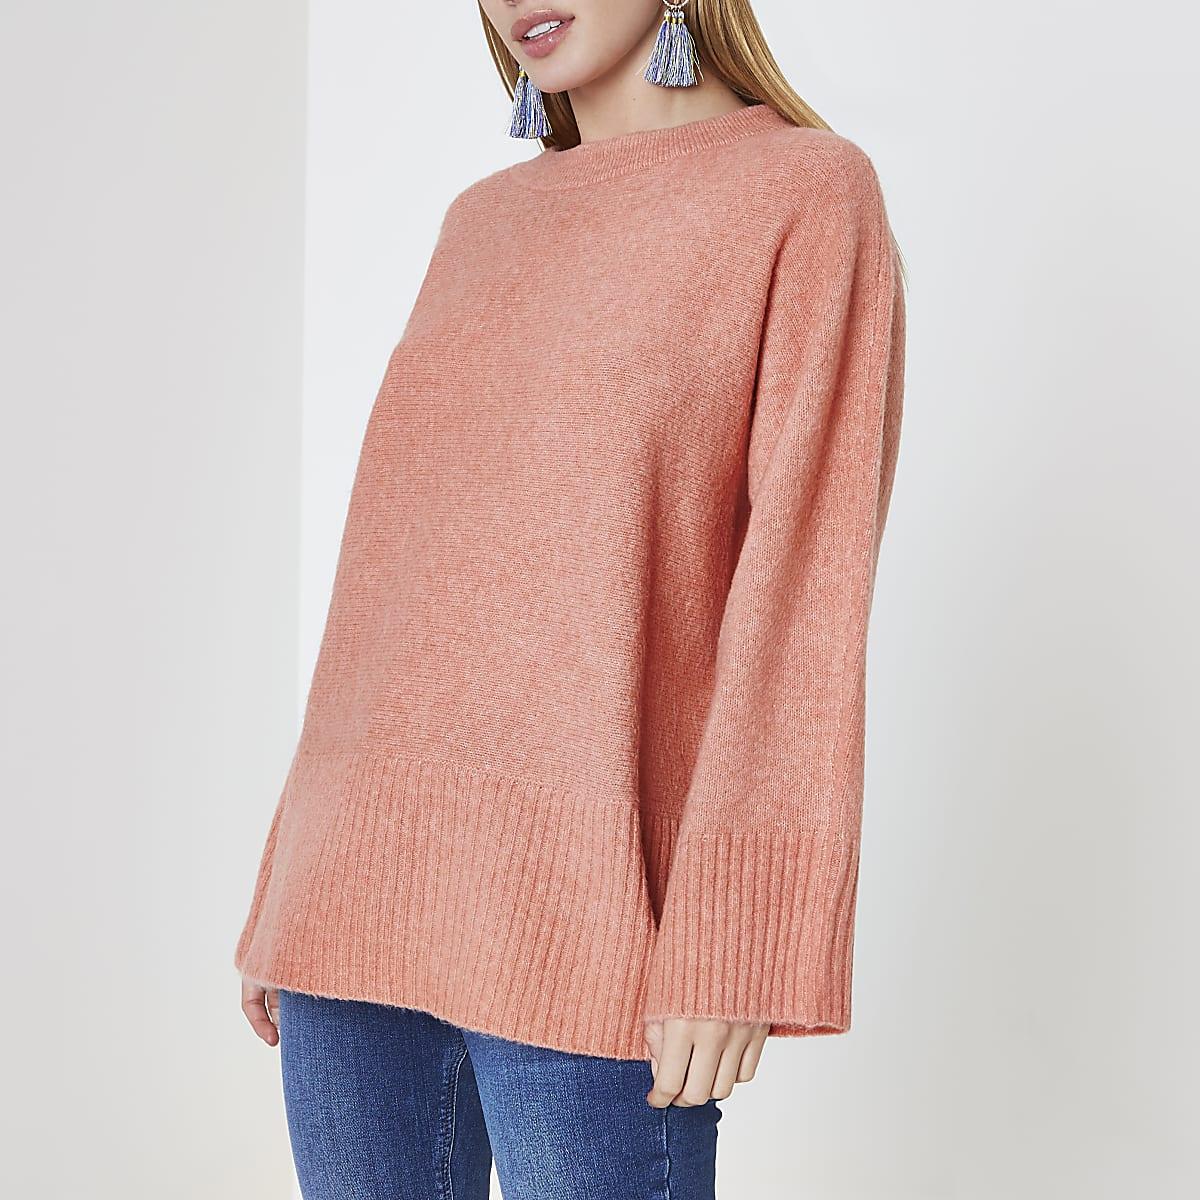 Petite orange tie back sweater